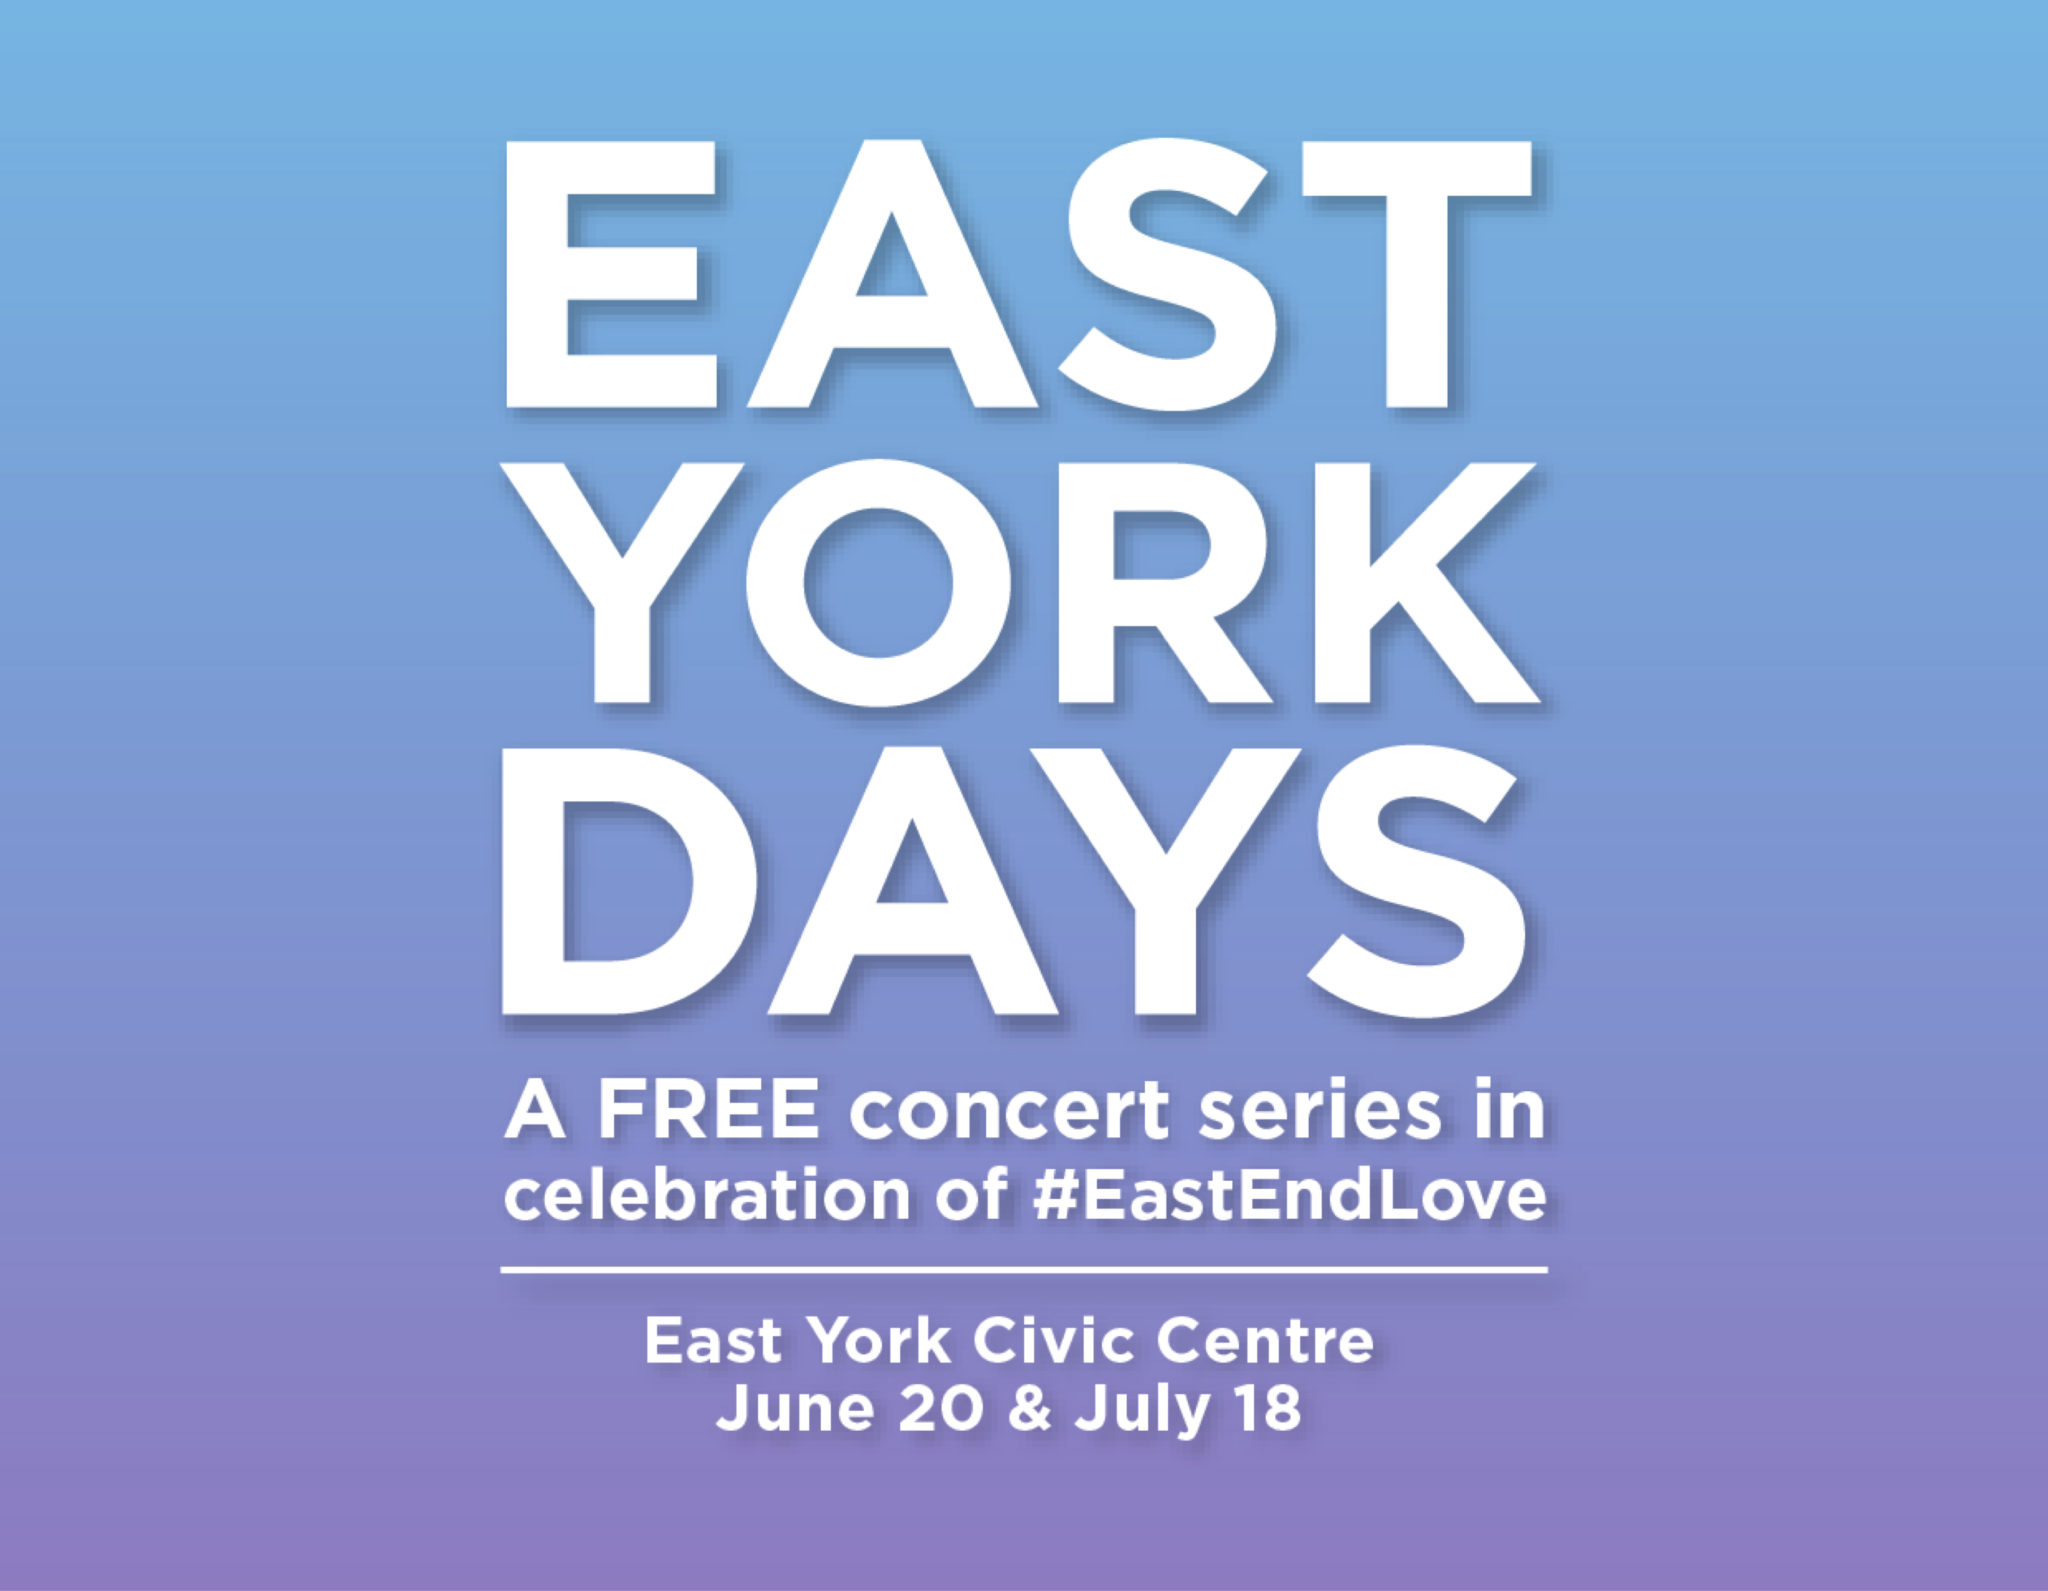 East York Days – Free Concert Series